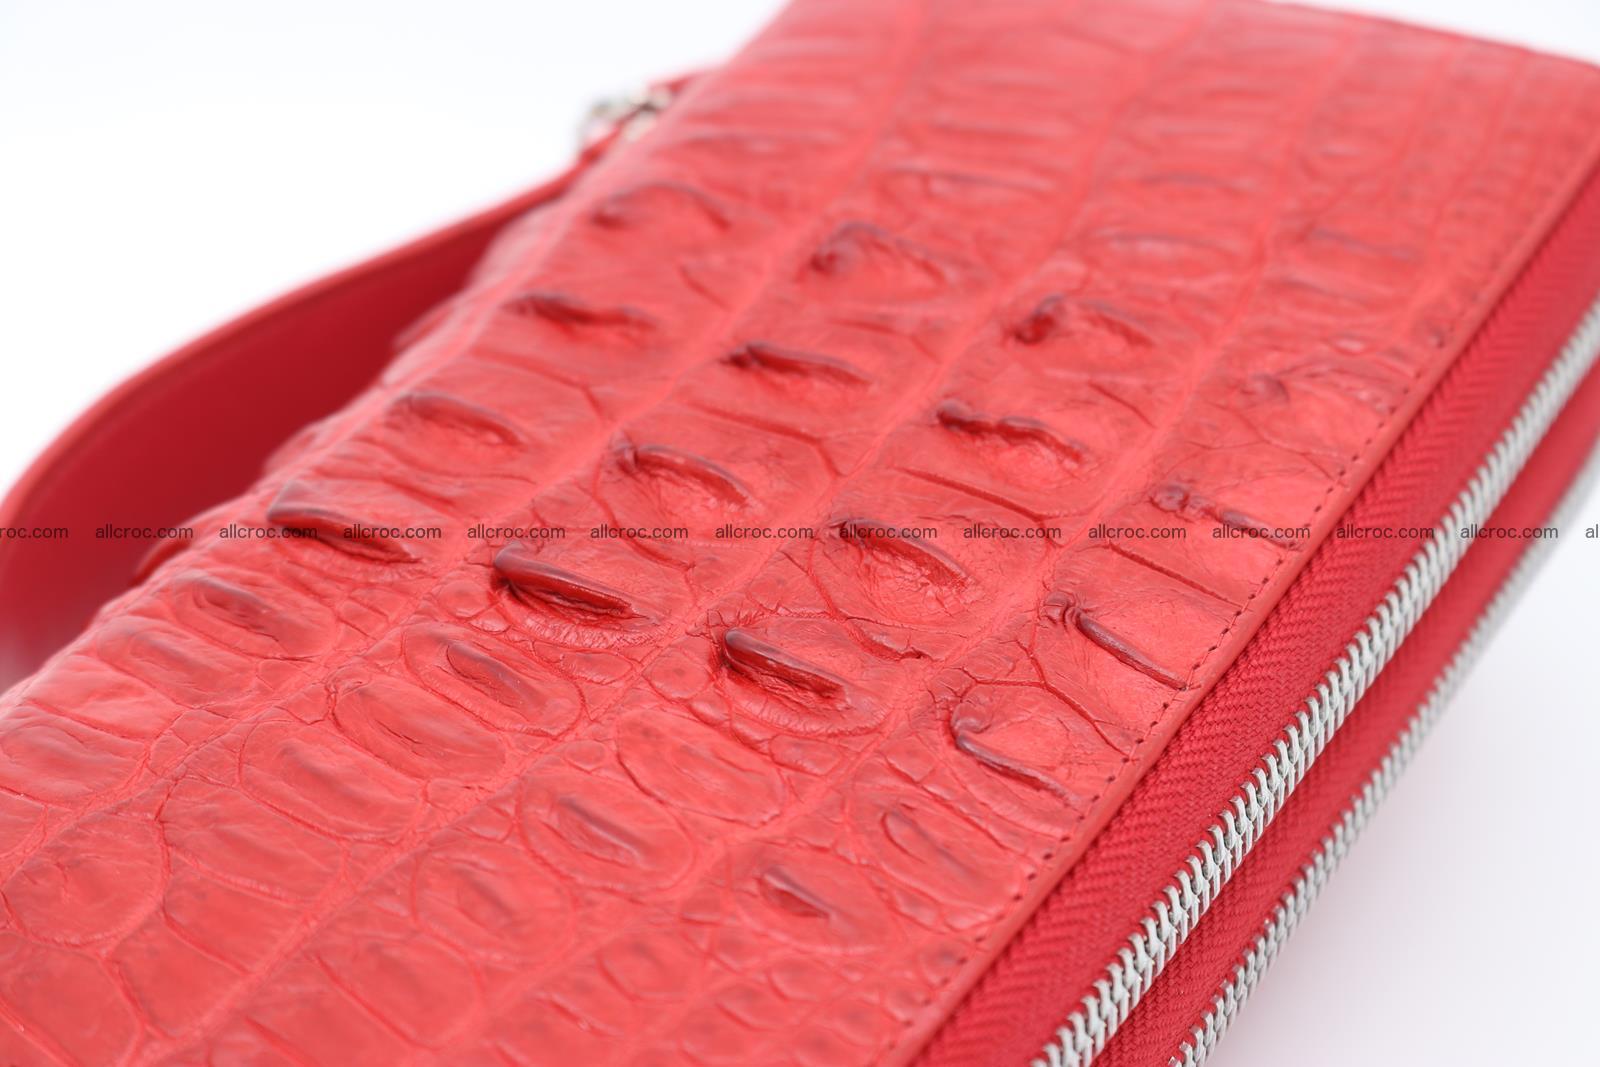 Crocodile skin clutch red color 2 zips 1263 Foto 5